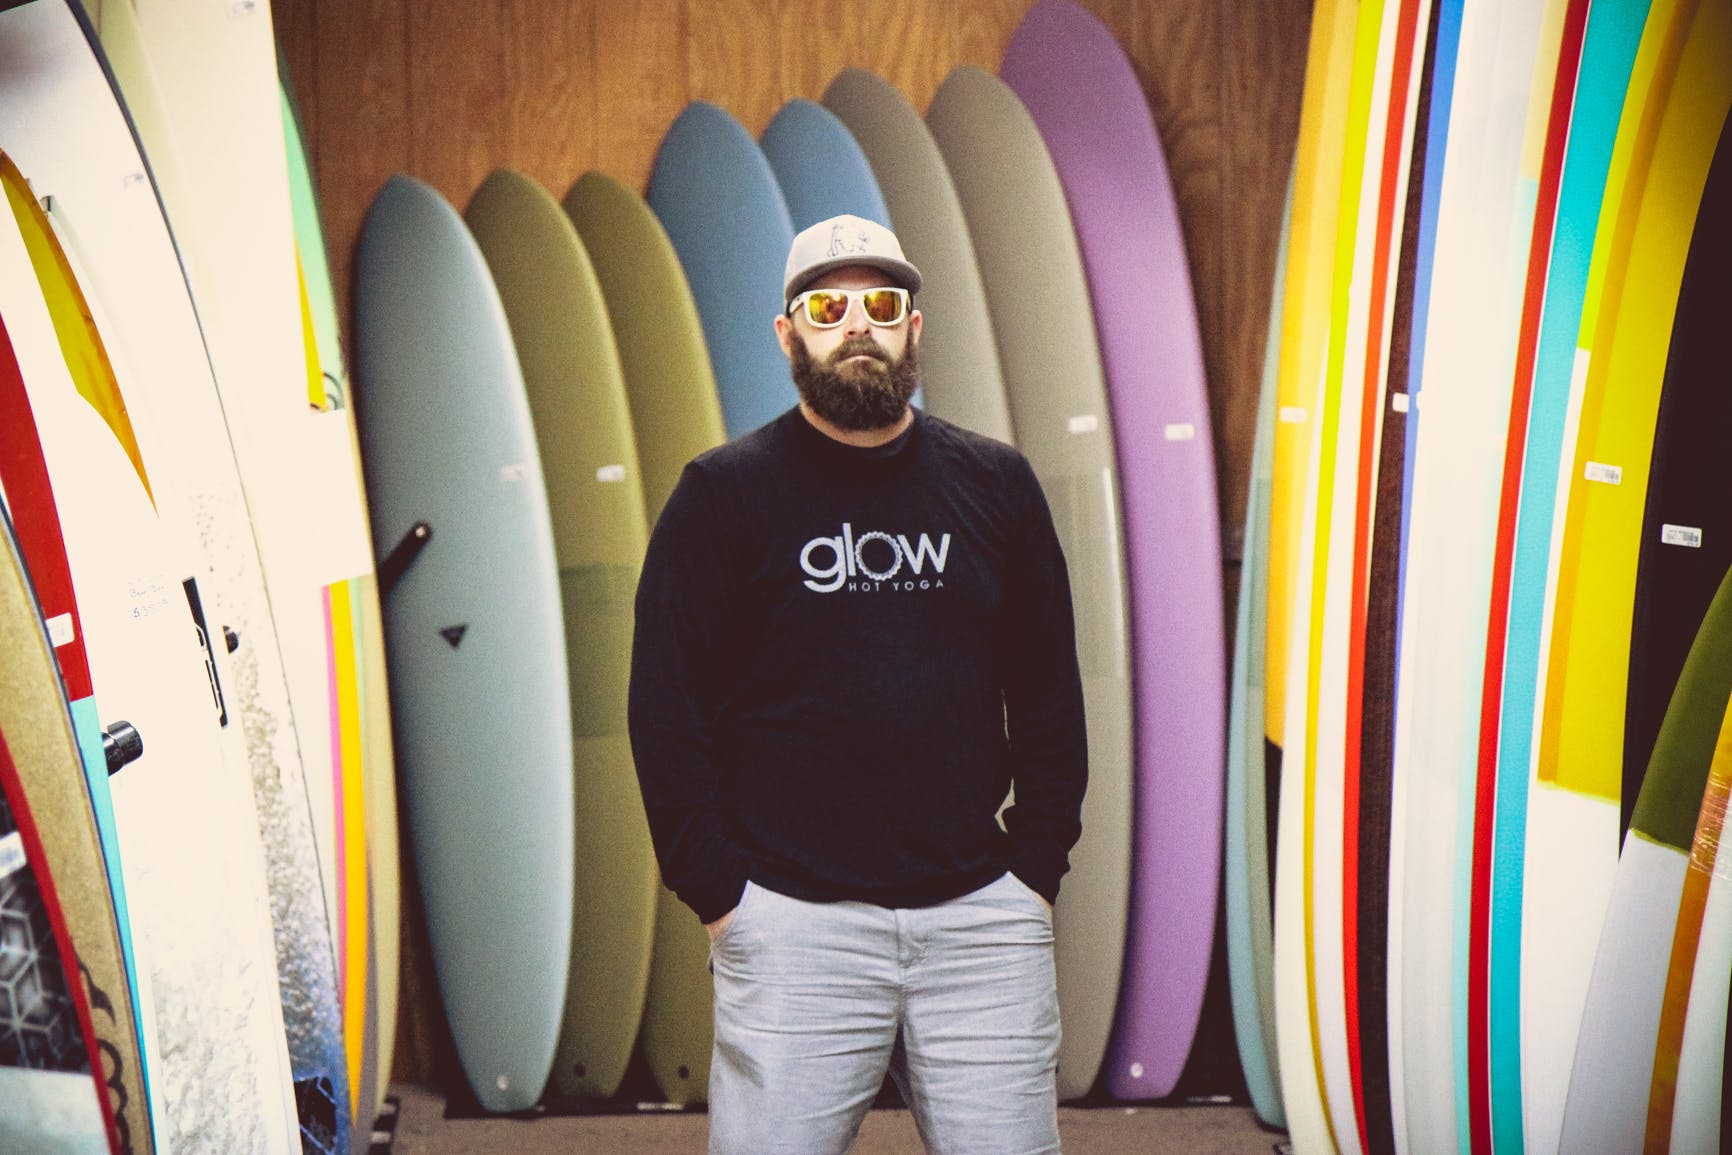 Man Wearing Black Glow-printed Sweatshirt